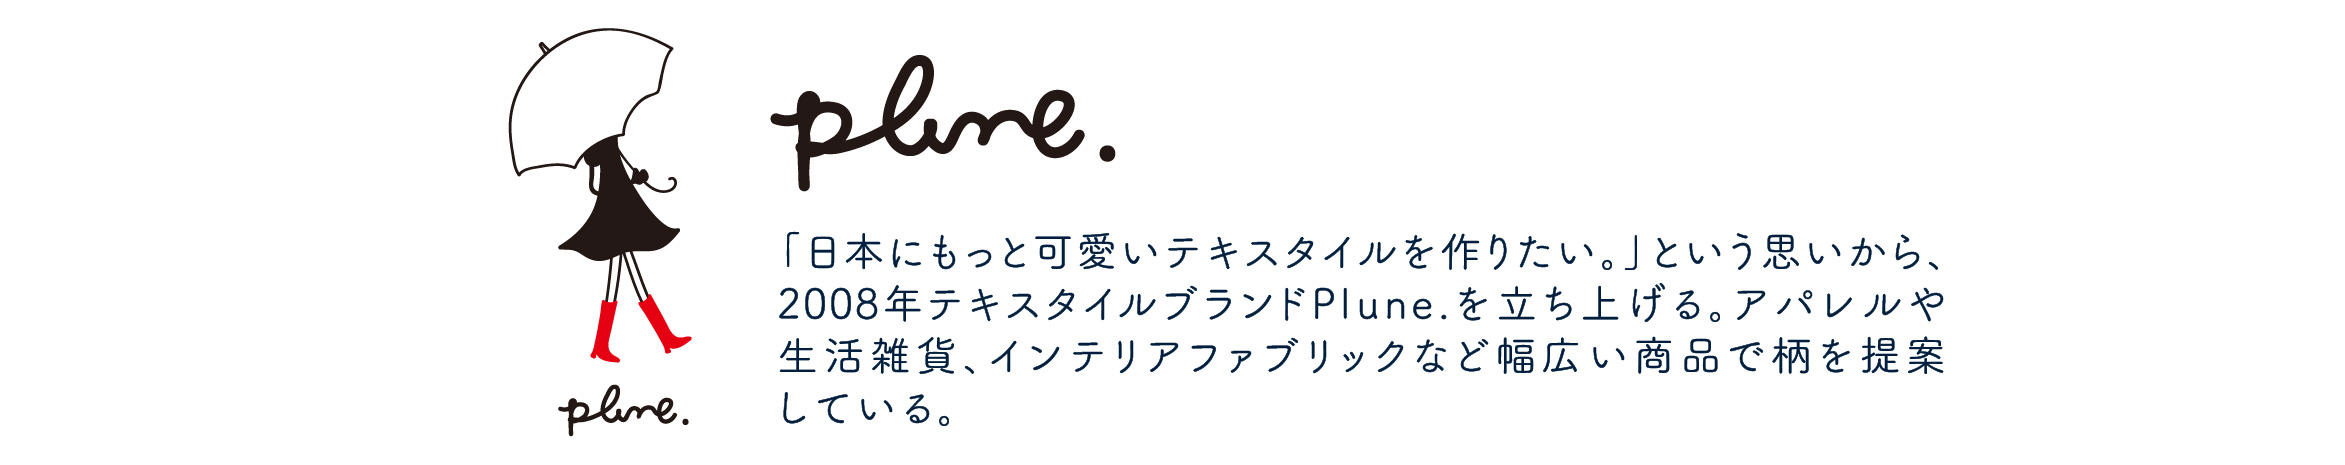 pluneブランド紹介